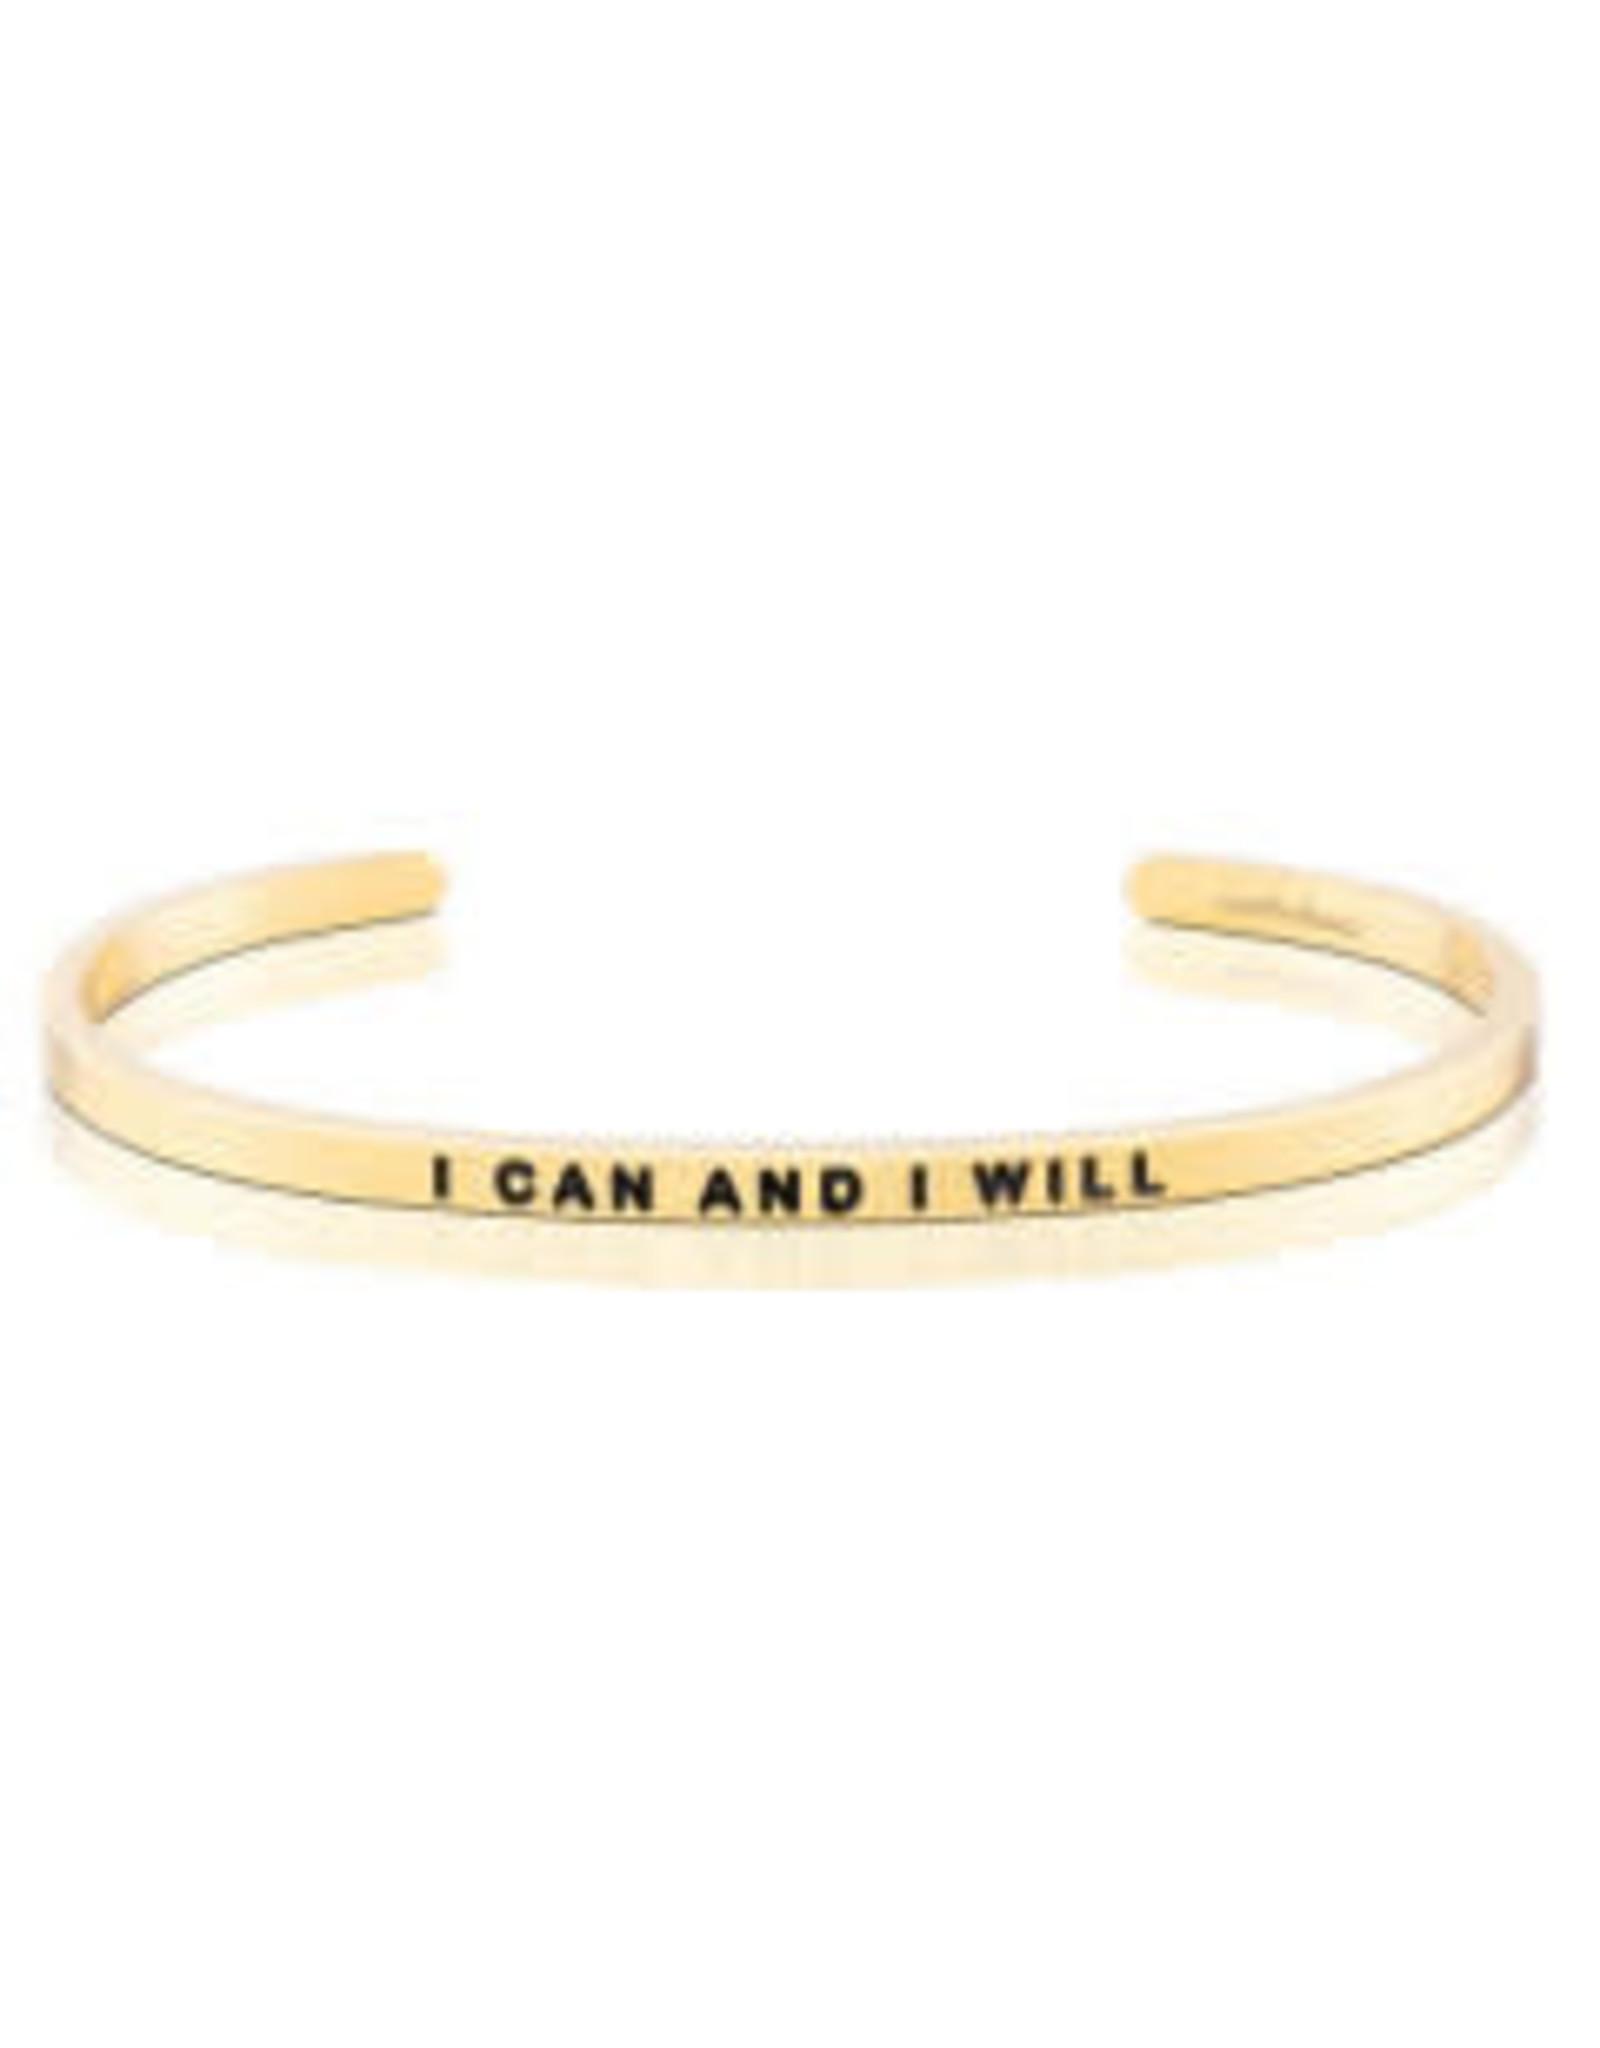 MantraBand MantraBand Bracelet, I Can And I Will